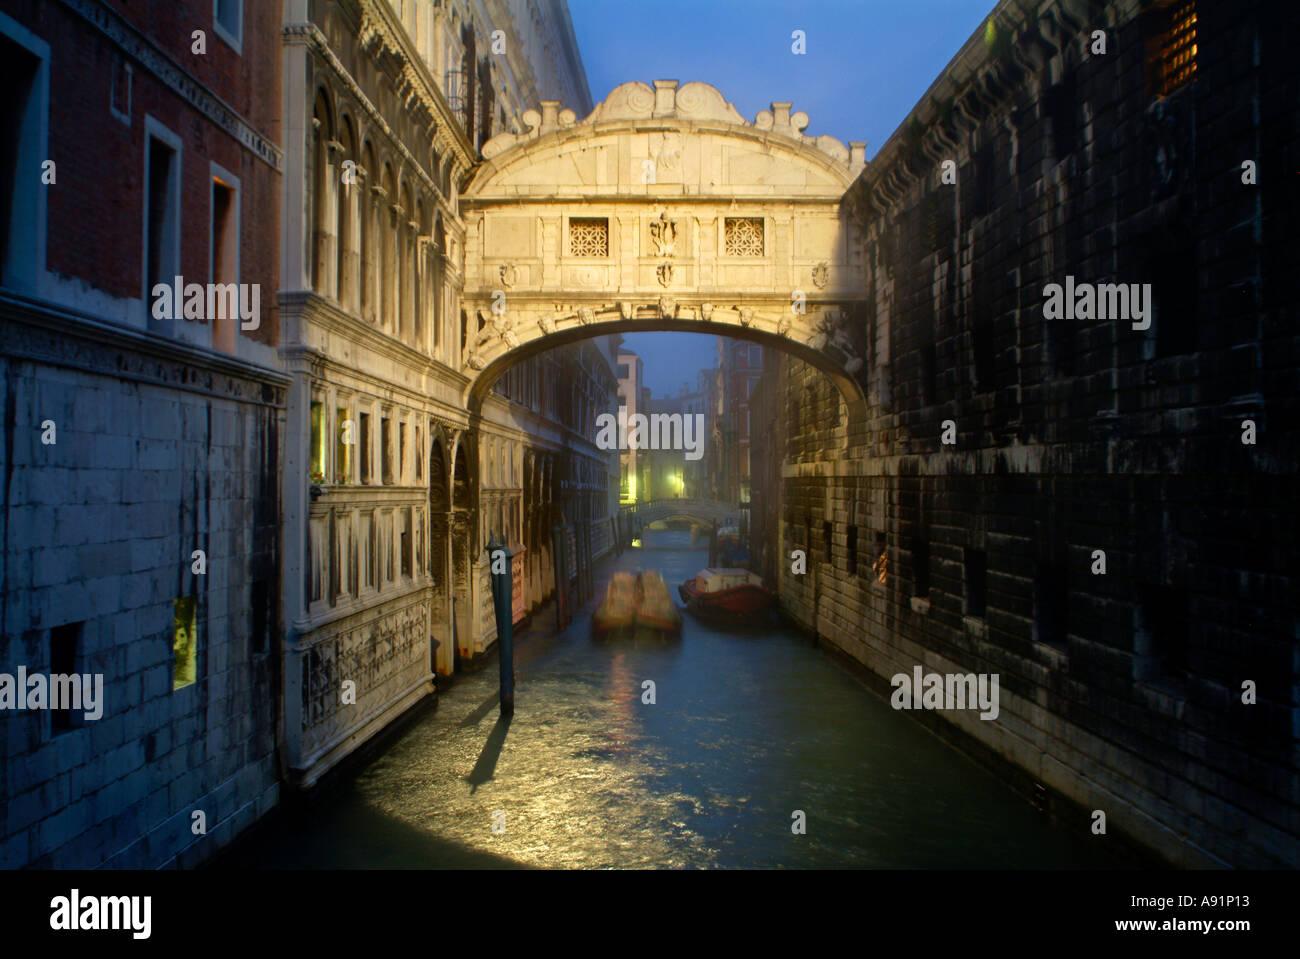 bridge of sighs in venice Seufzerbrücke am Palazzo Ducale Dogenpalast und Palazzo d Prigiono in Venedig bei Sonnenaufgang - Stock Image